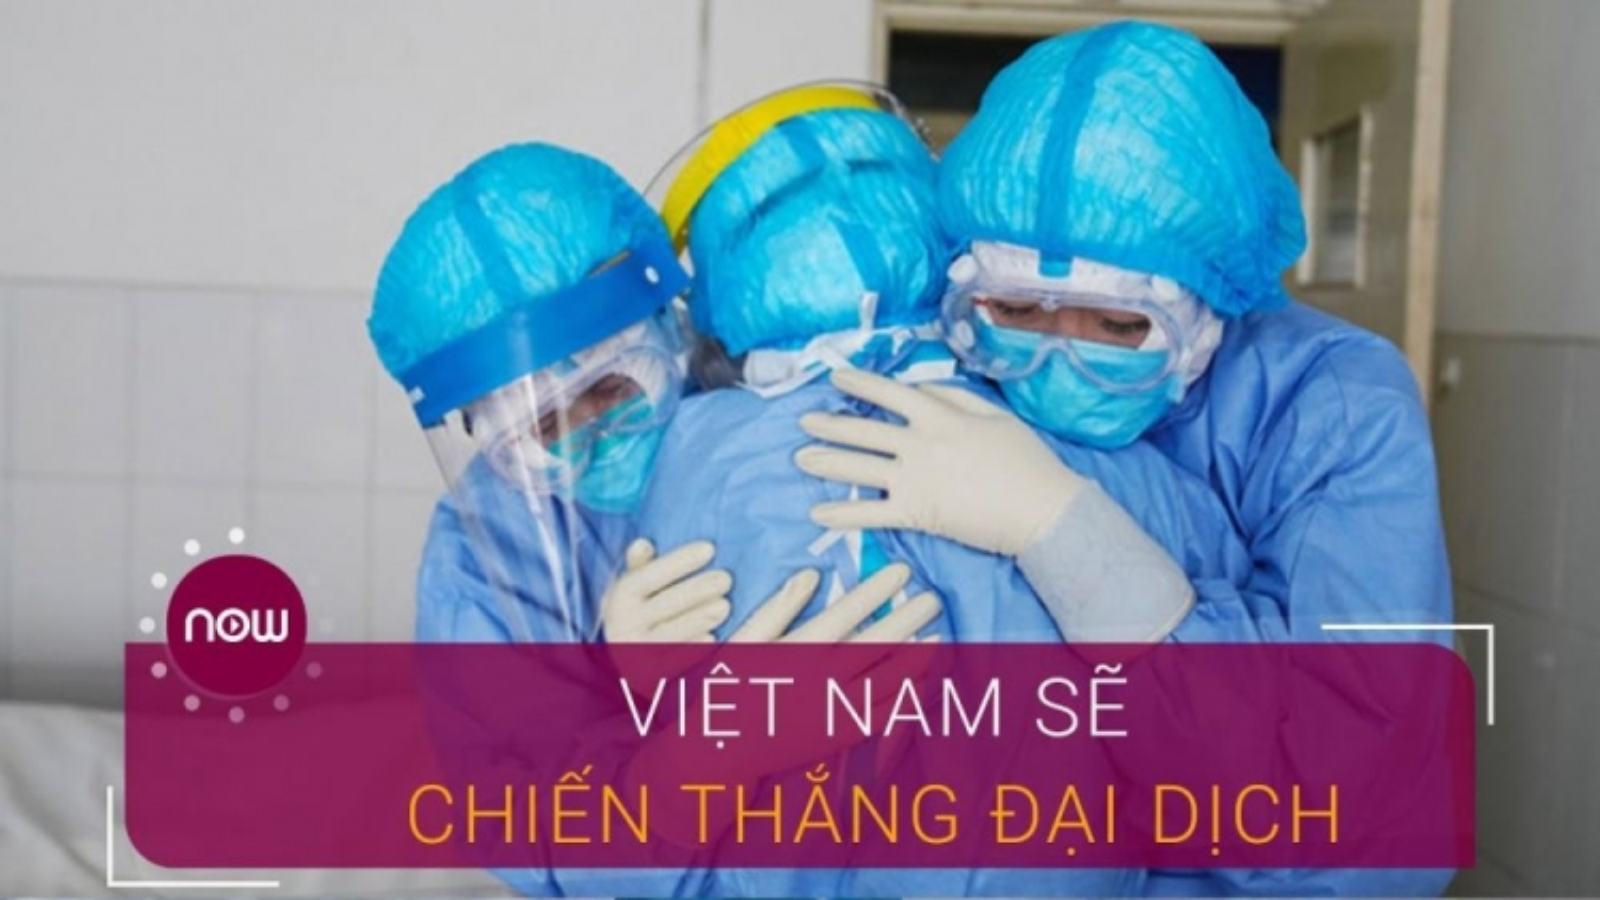 Vietnam's COVID-19 response initiative earns international plaudits